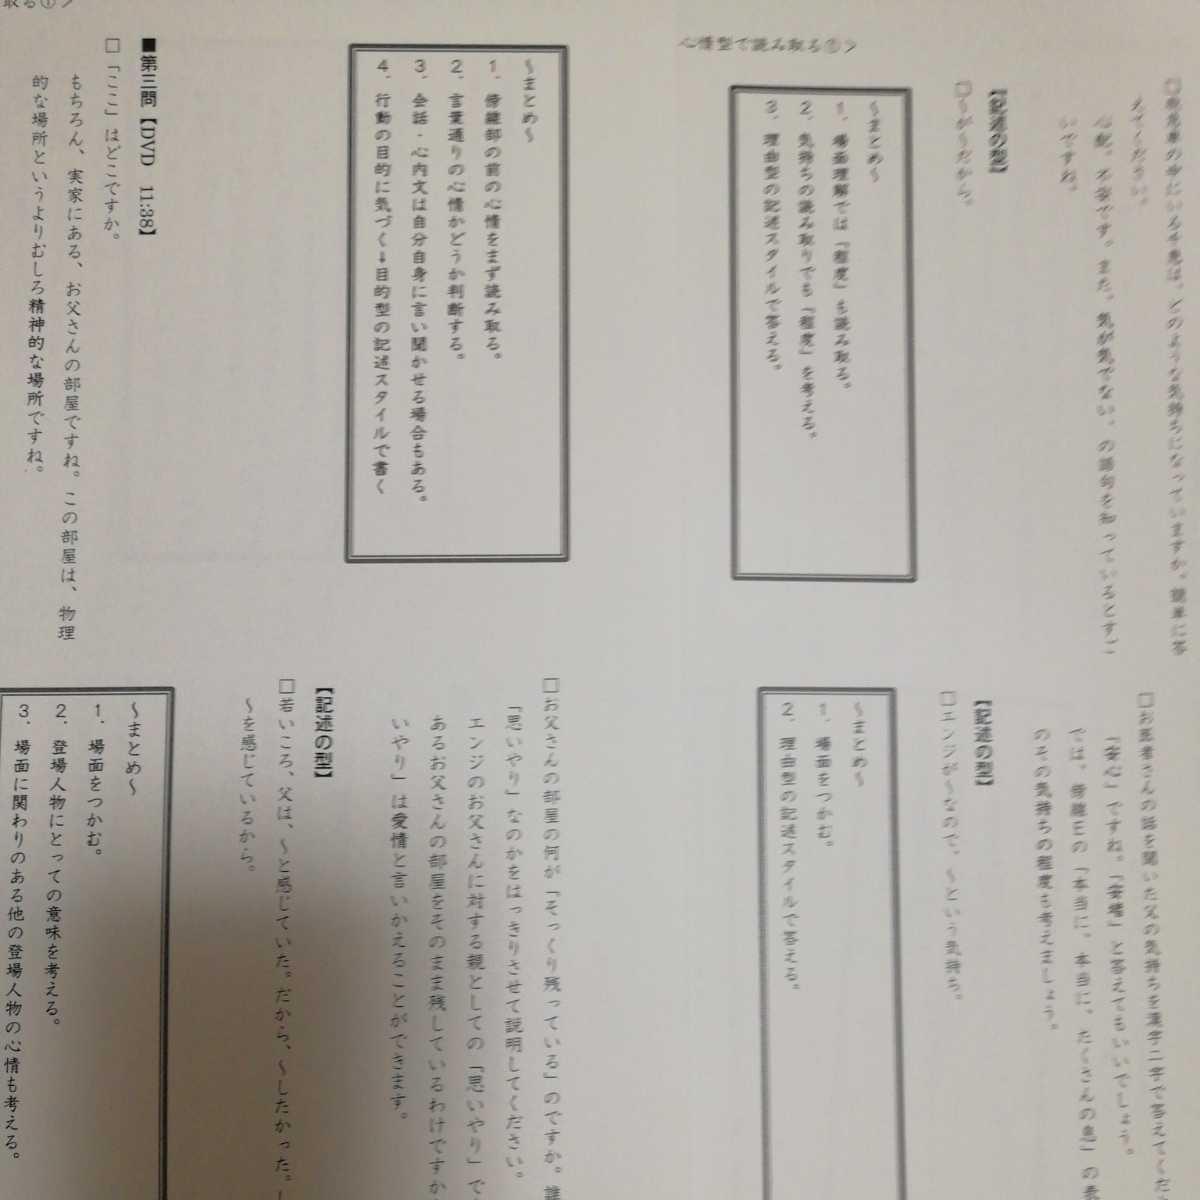 送料込 即決 DVD1-8巻 中学受験 小学生 小学国語 知力の背骨 最短構築プログラム プロ家庭教師 西村則康先生